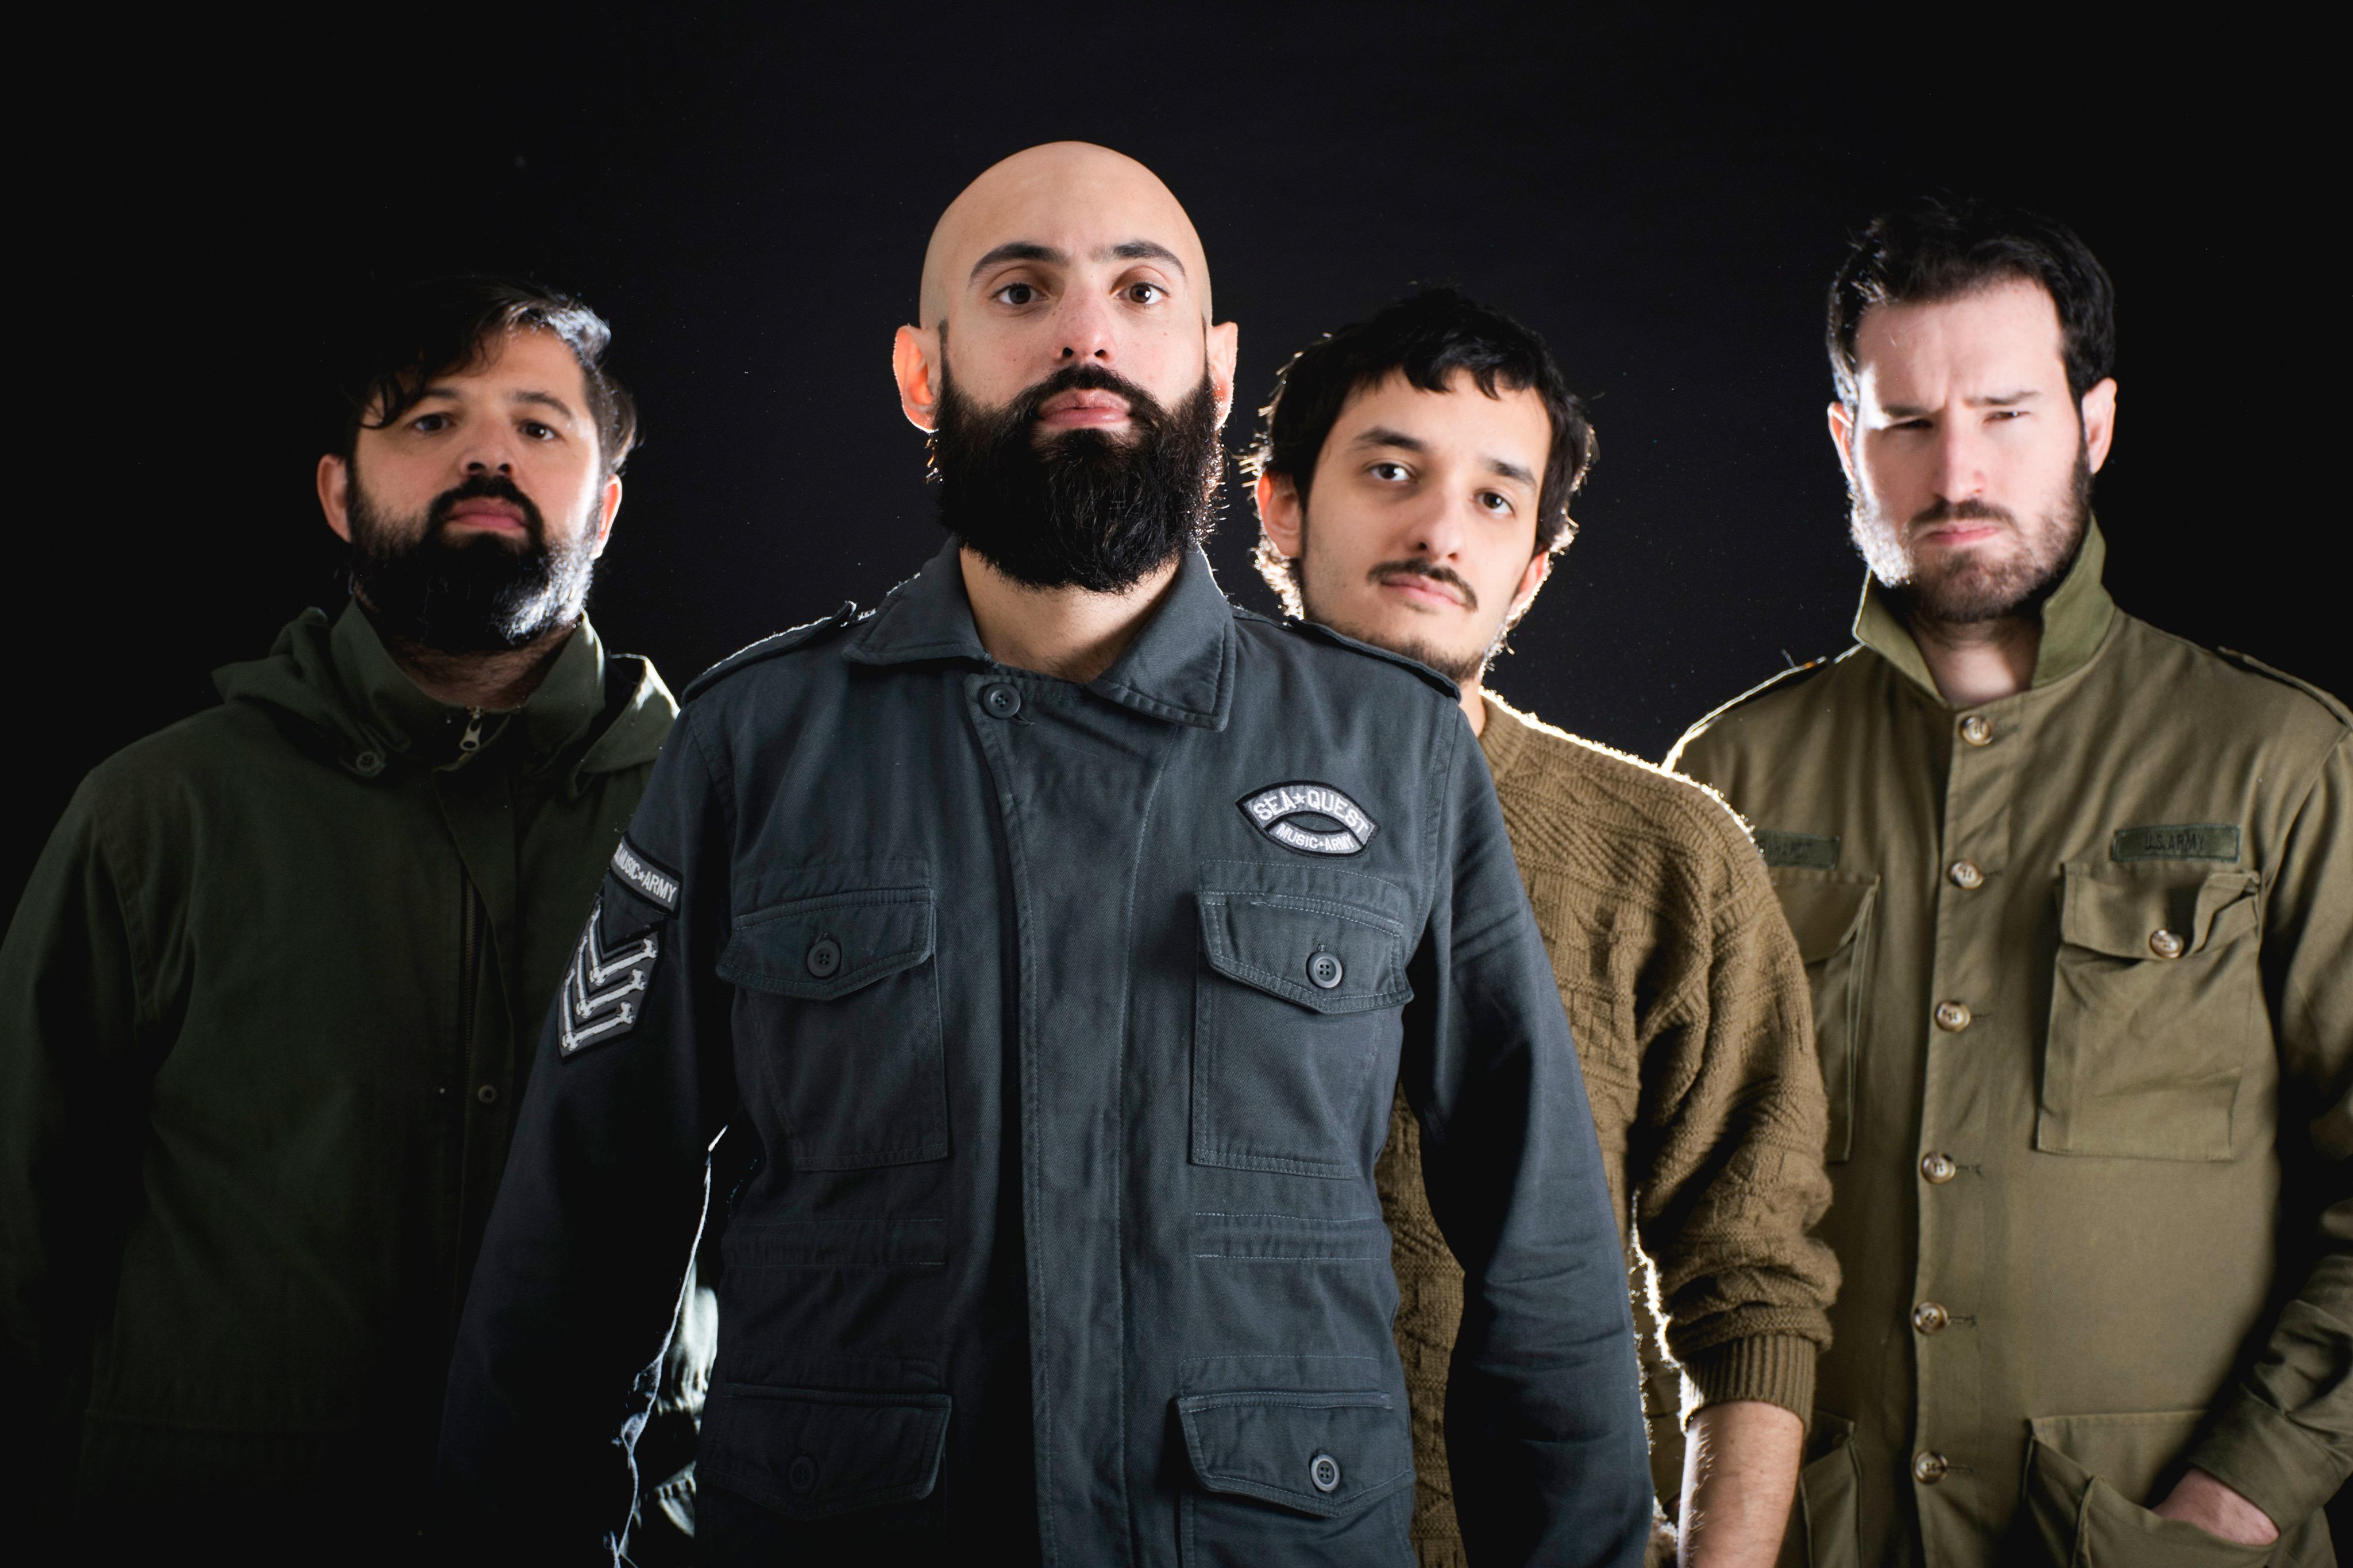 The Vostok lanza su álbum debut